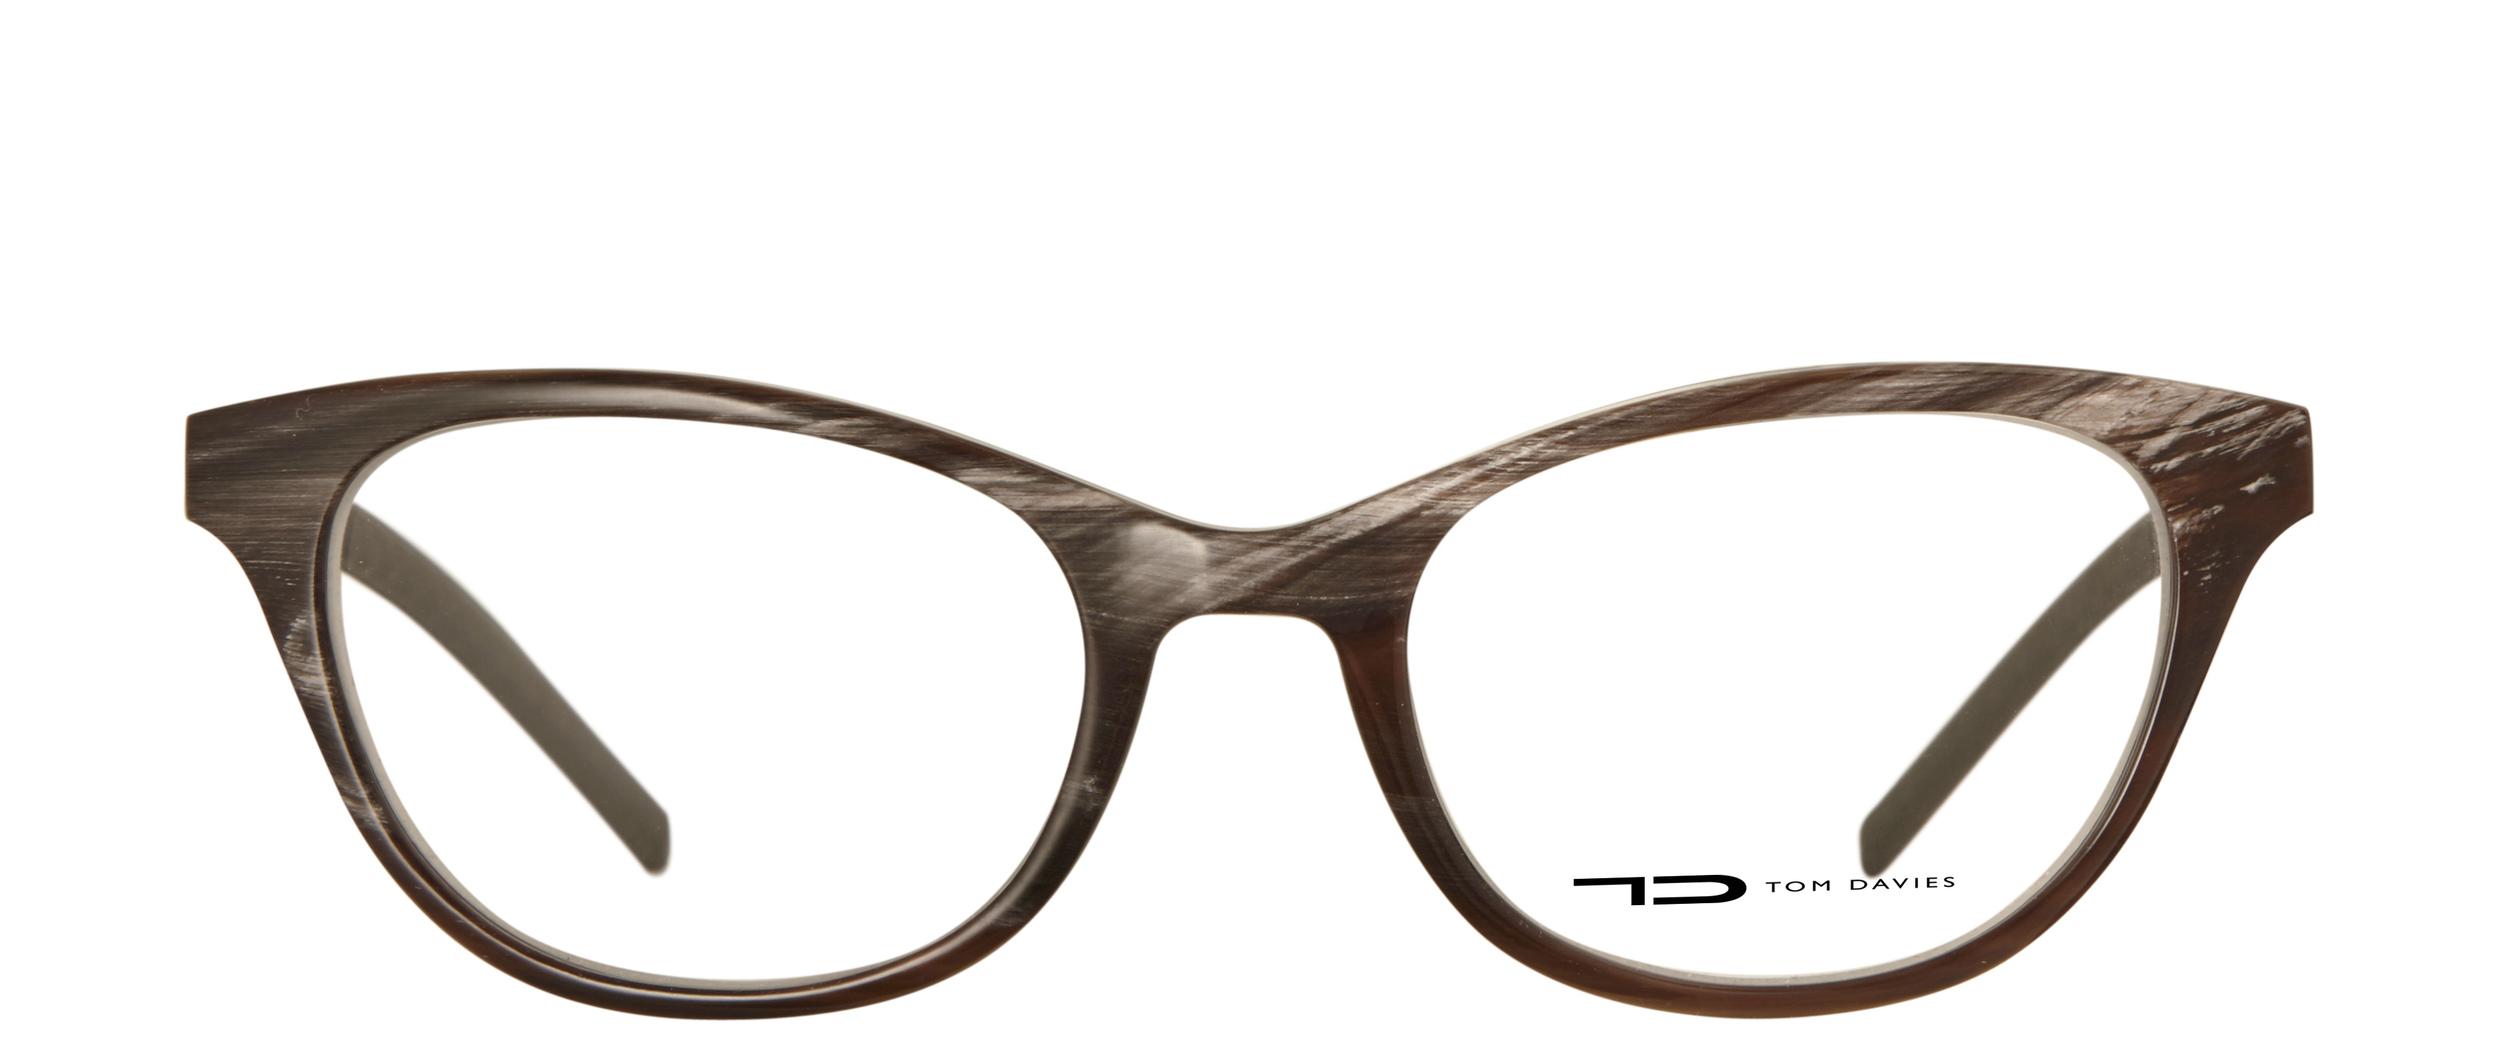 TD Tom Davies Bespoke eyewear eye-bar sherwood park edmonton - 22573_a.jpg